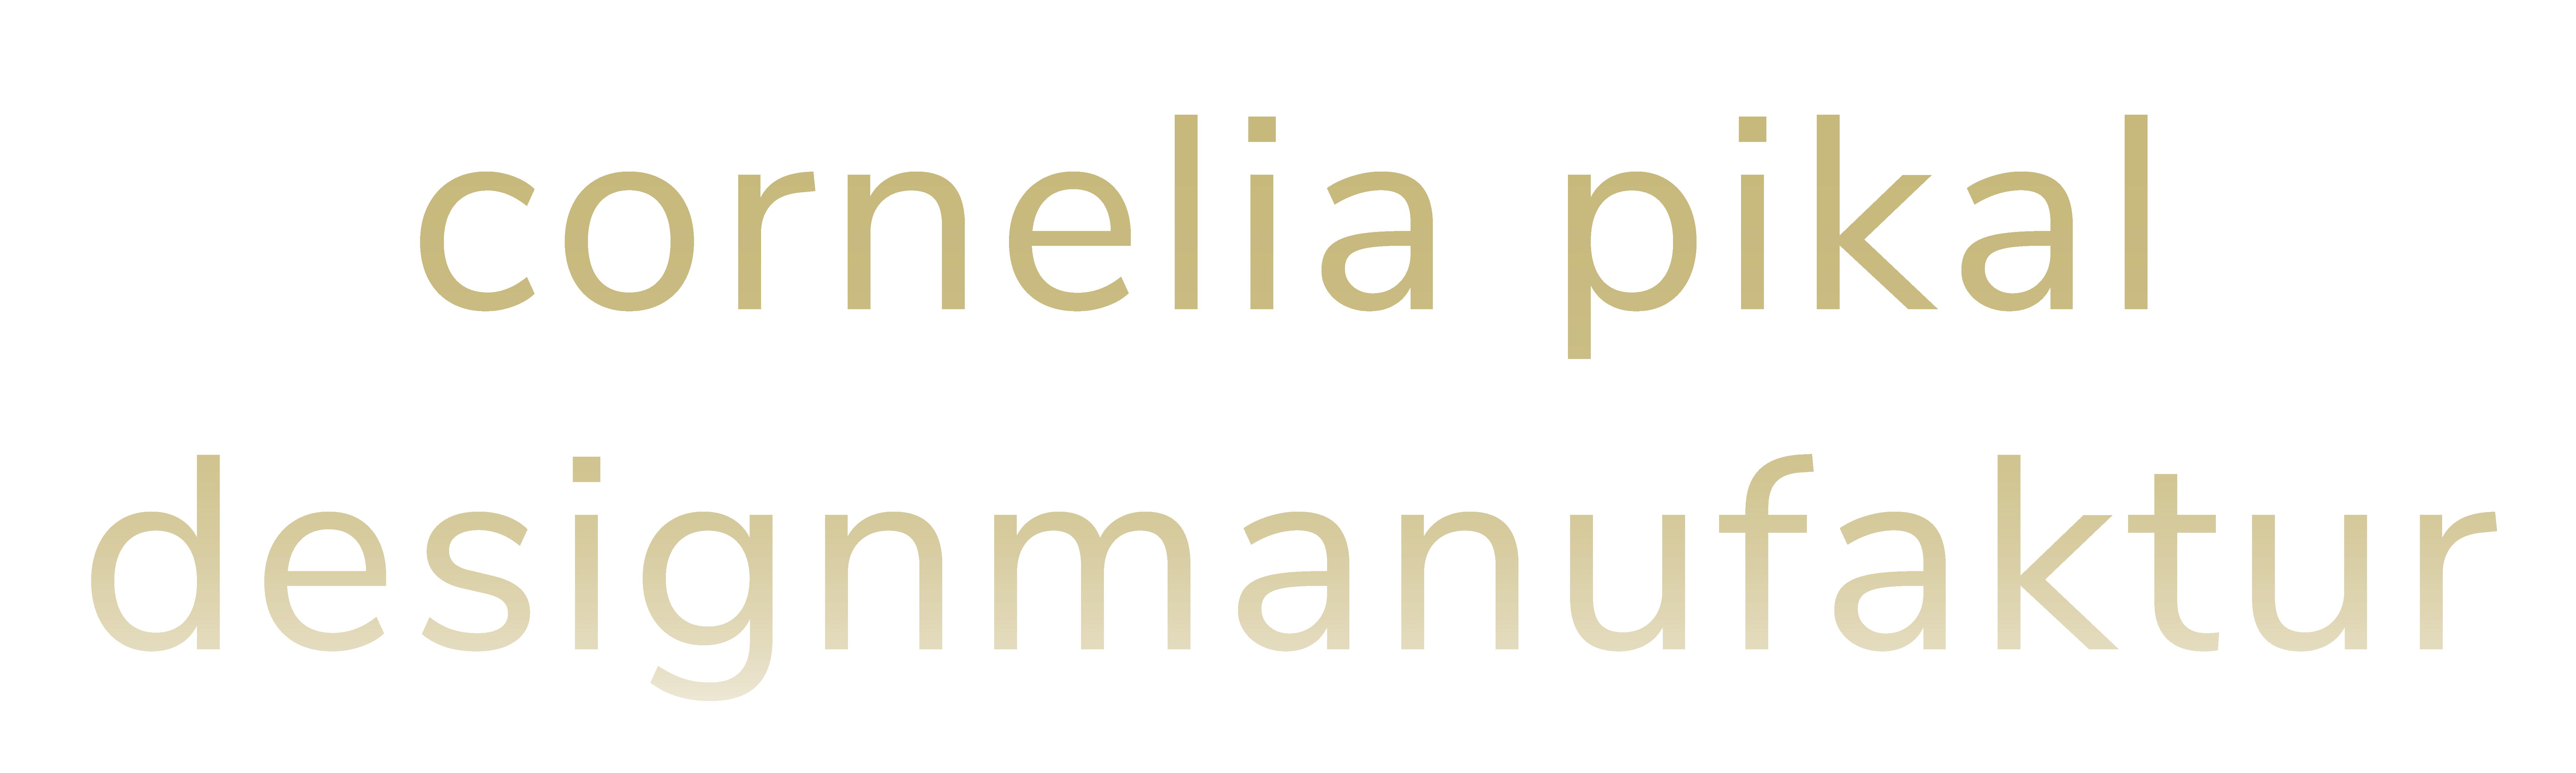 Designmanufaktur Cornelia Pikal